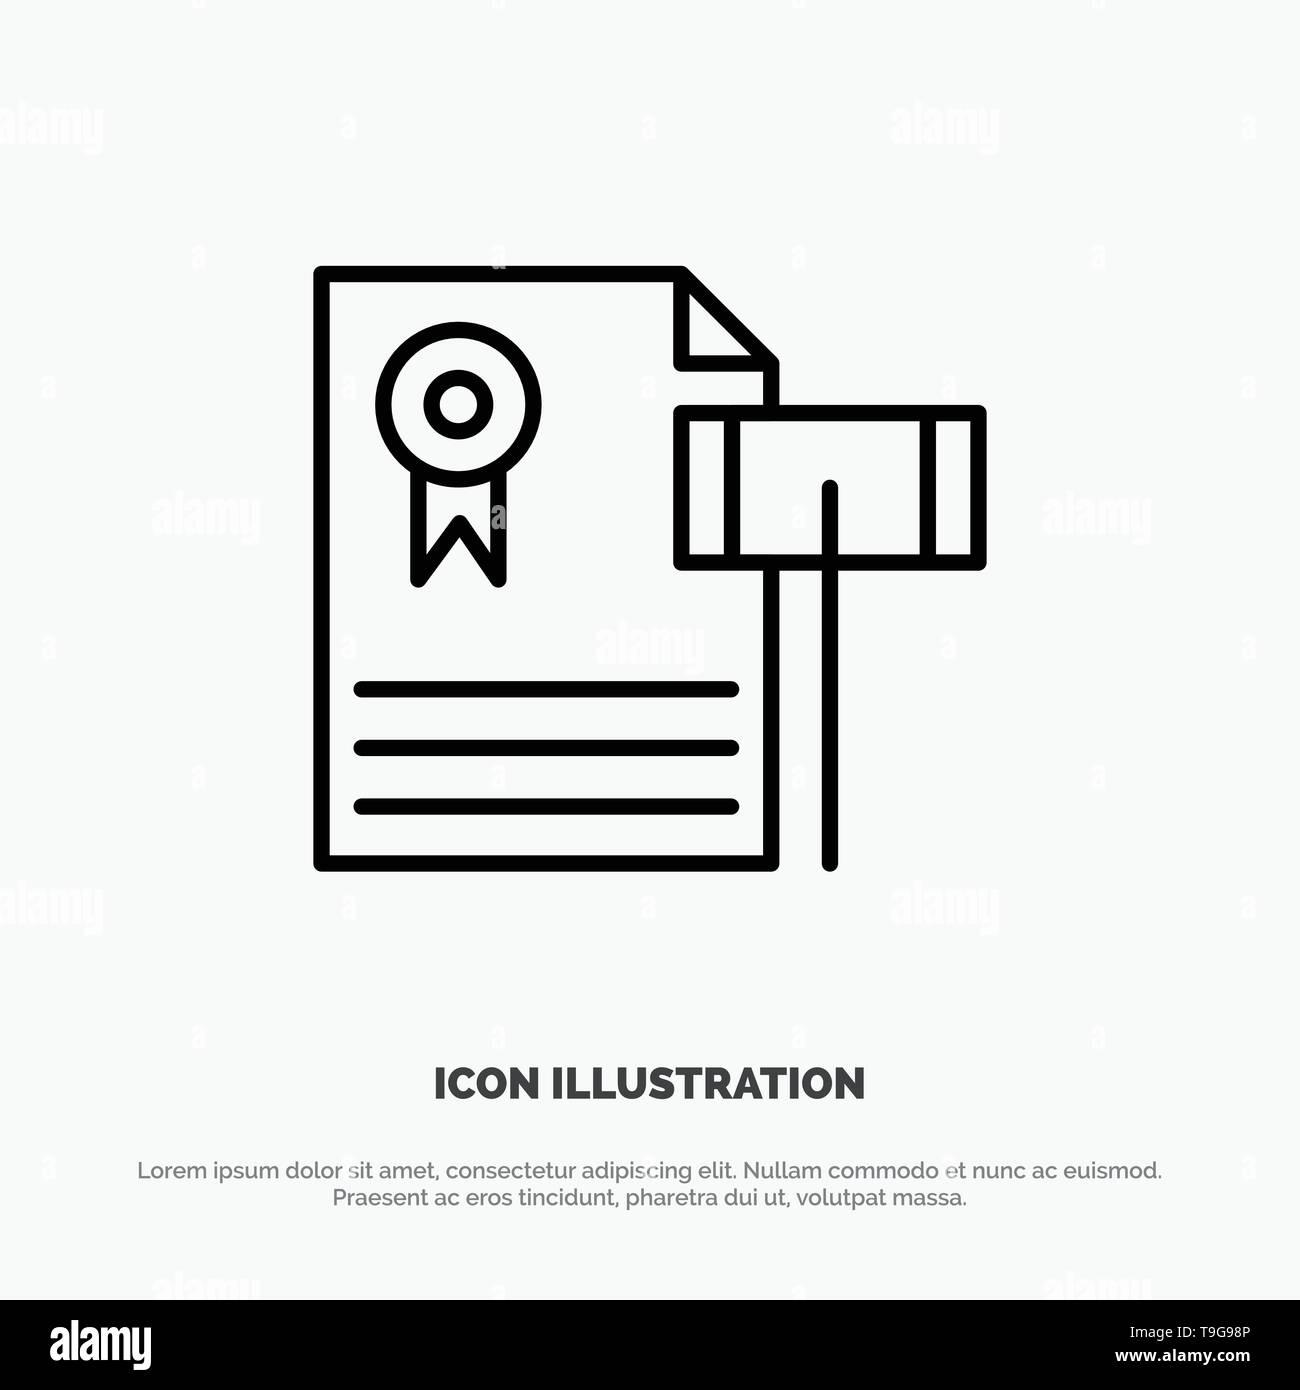 Auction, Vintage, Expensive, Gravel, Judge Line Icon Vector - Stock Image